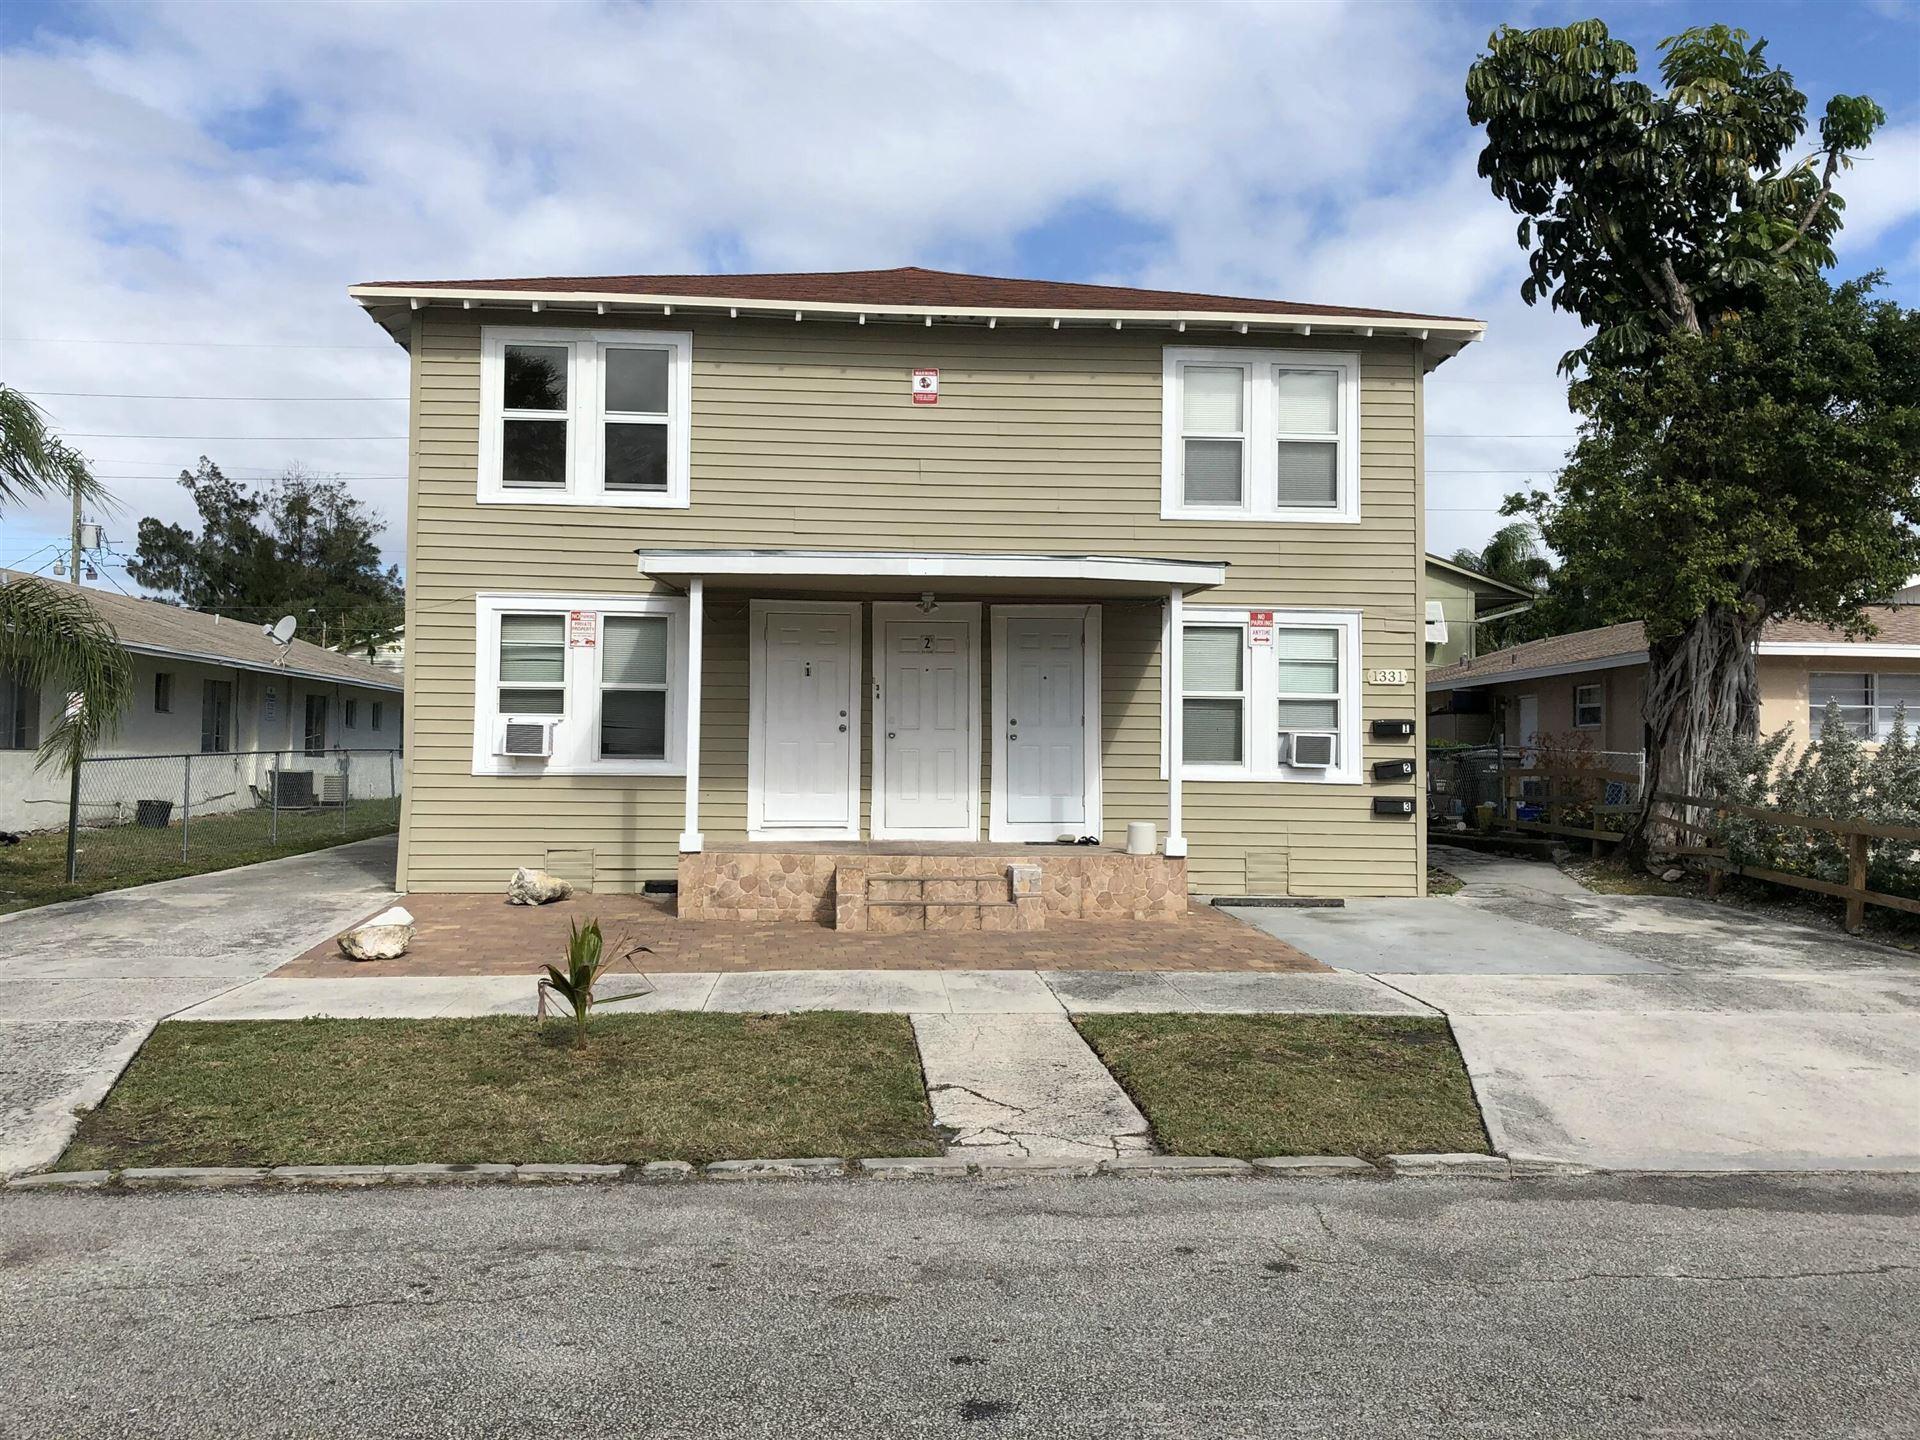 1331 Longwood 1 Street, West Palm Beach, FL 33401 - MLS#: RX-10742816